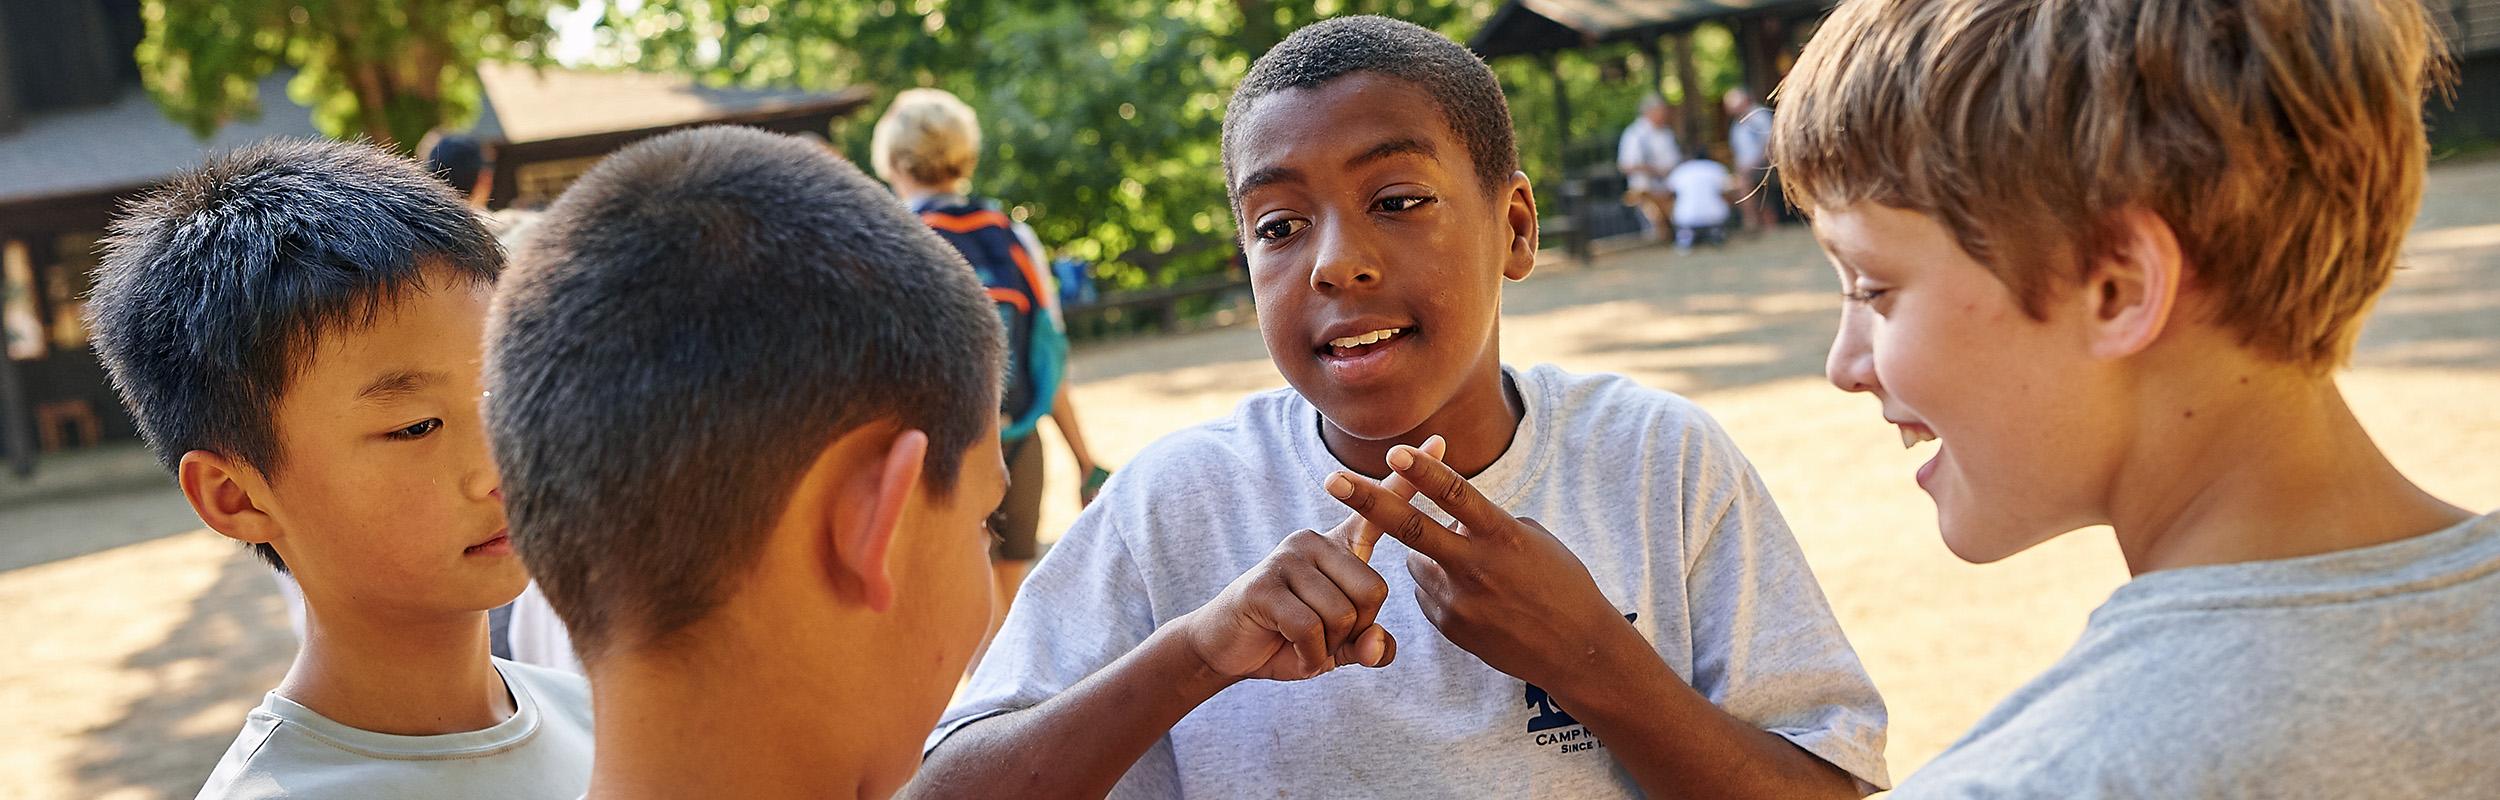 Camp Mowglis Inclusion Statement